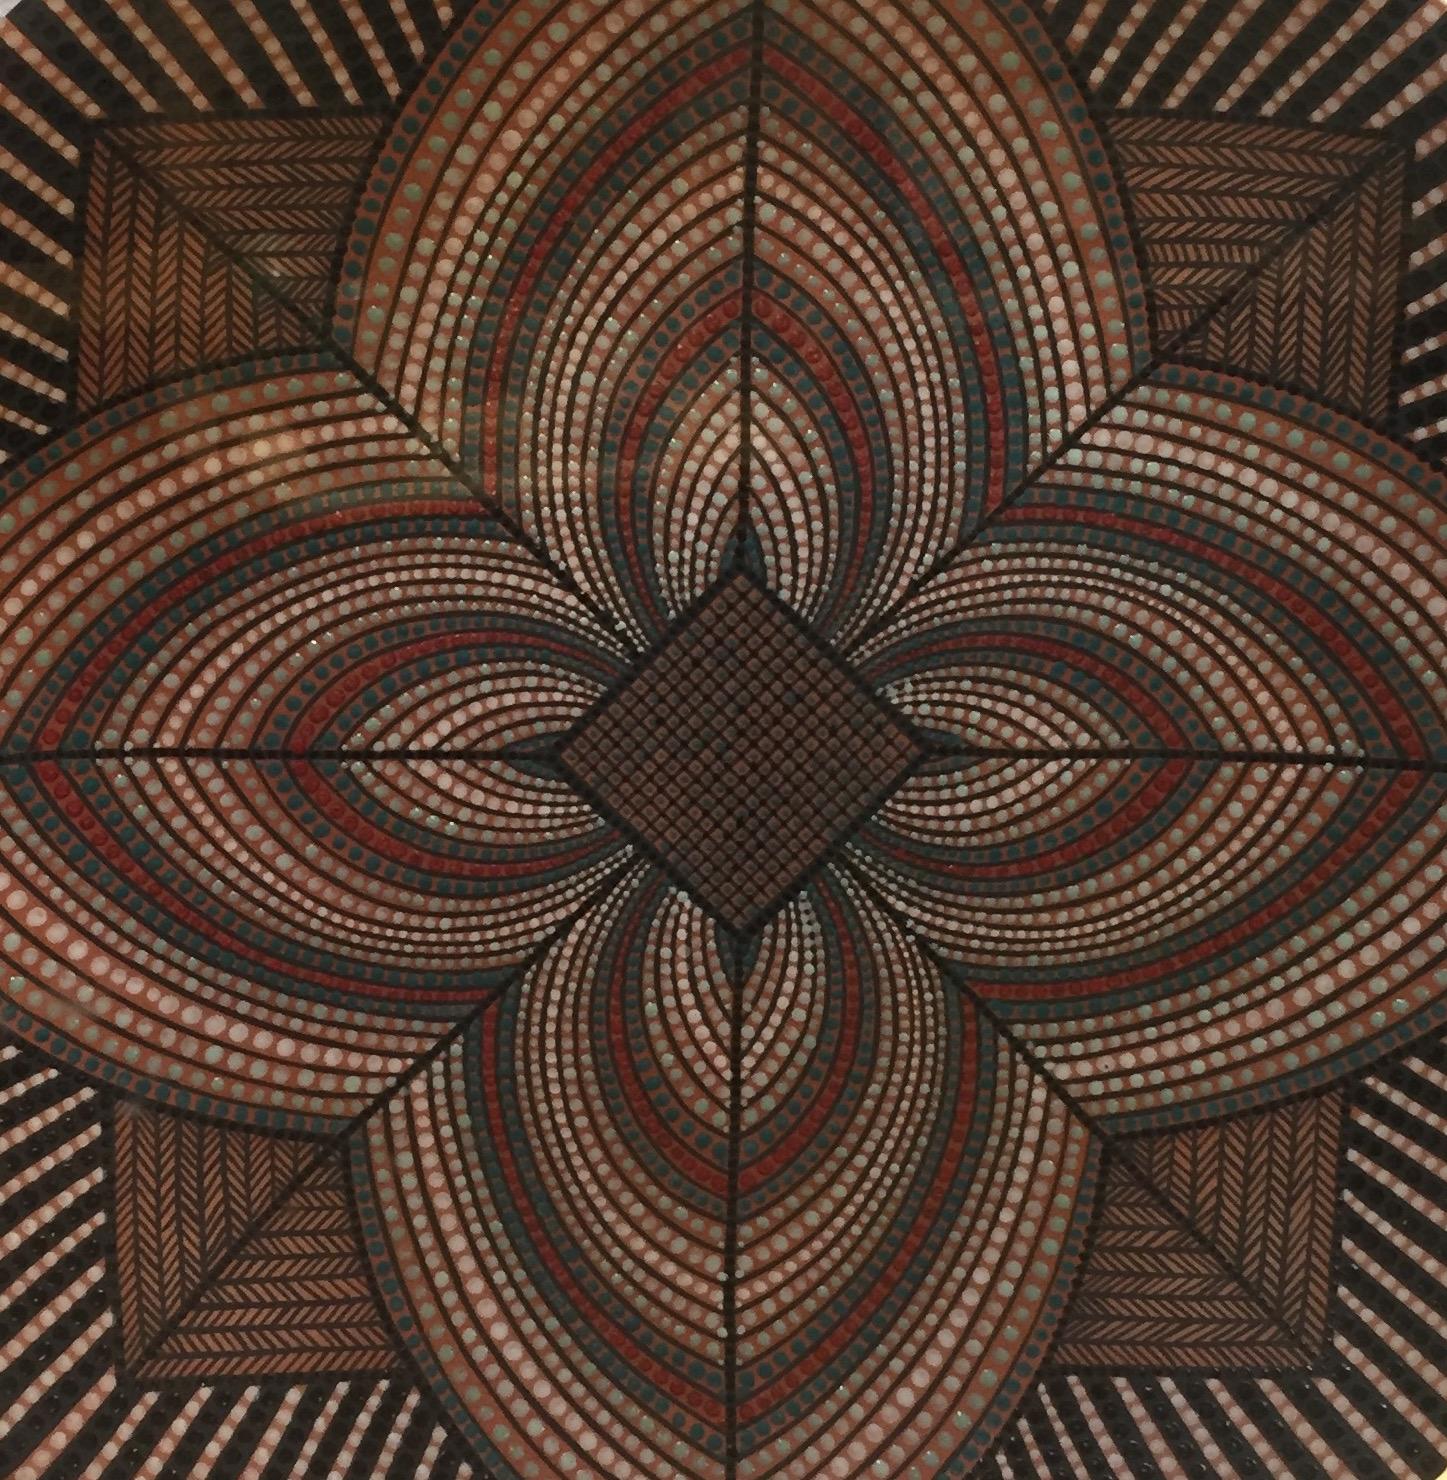 PATTERNS IN FIBER & CLAY EXHIBITION - FCAM Ceramic Art Detail - BY RICKY MALODANO